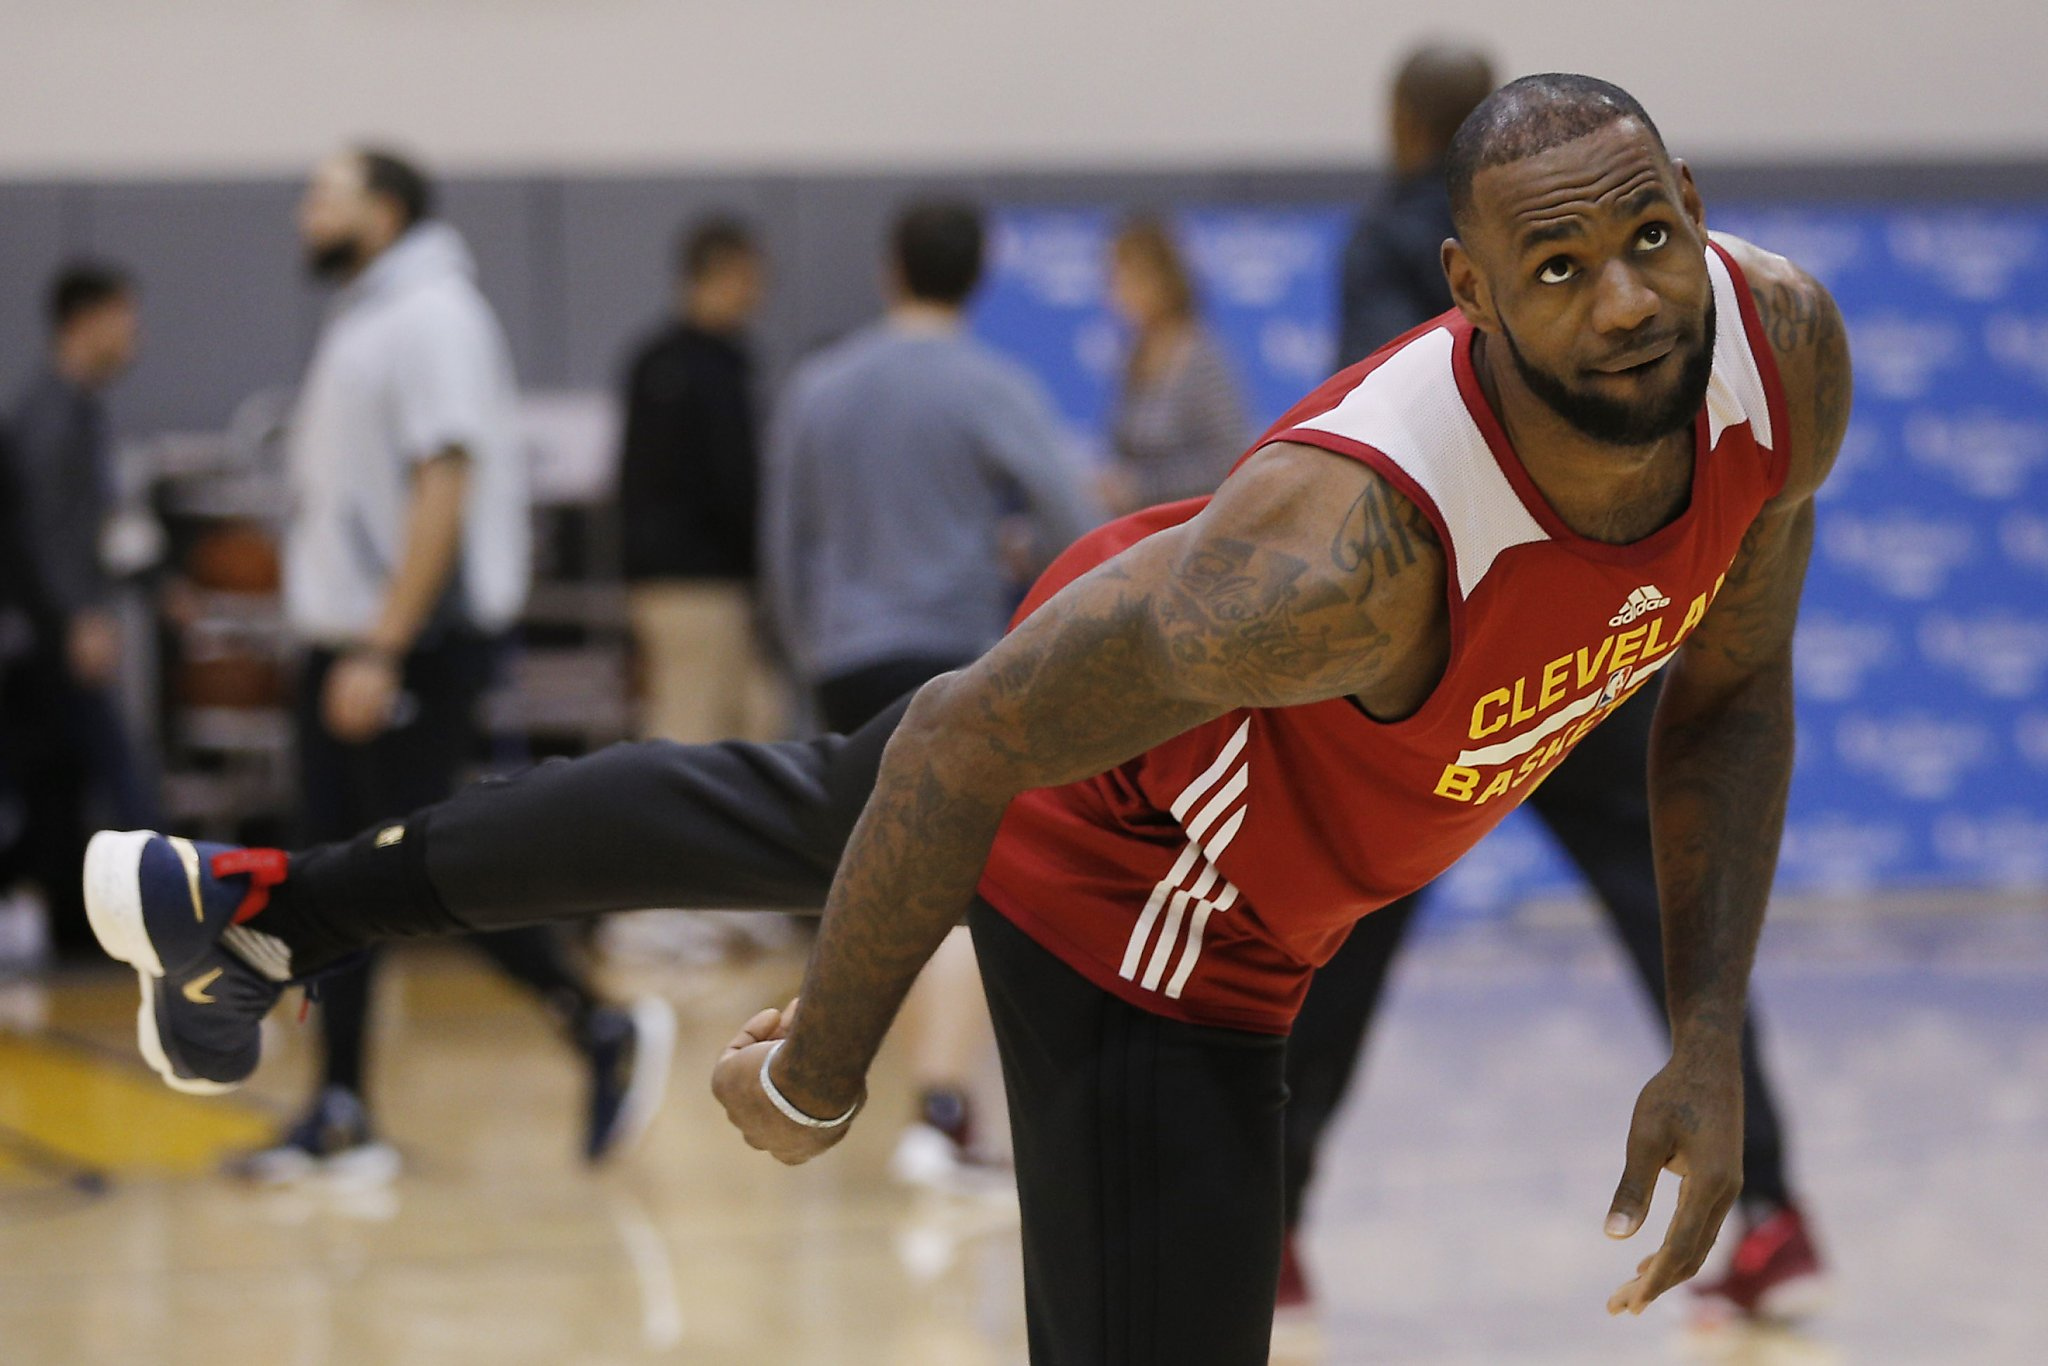 8d26182e19c5 Cleveland s LeBron James aims to extend road playoff streak - San Antonio  Express-News